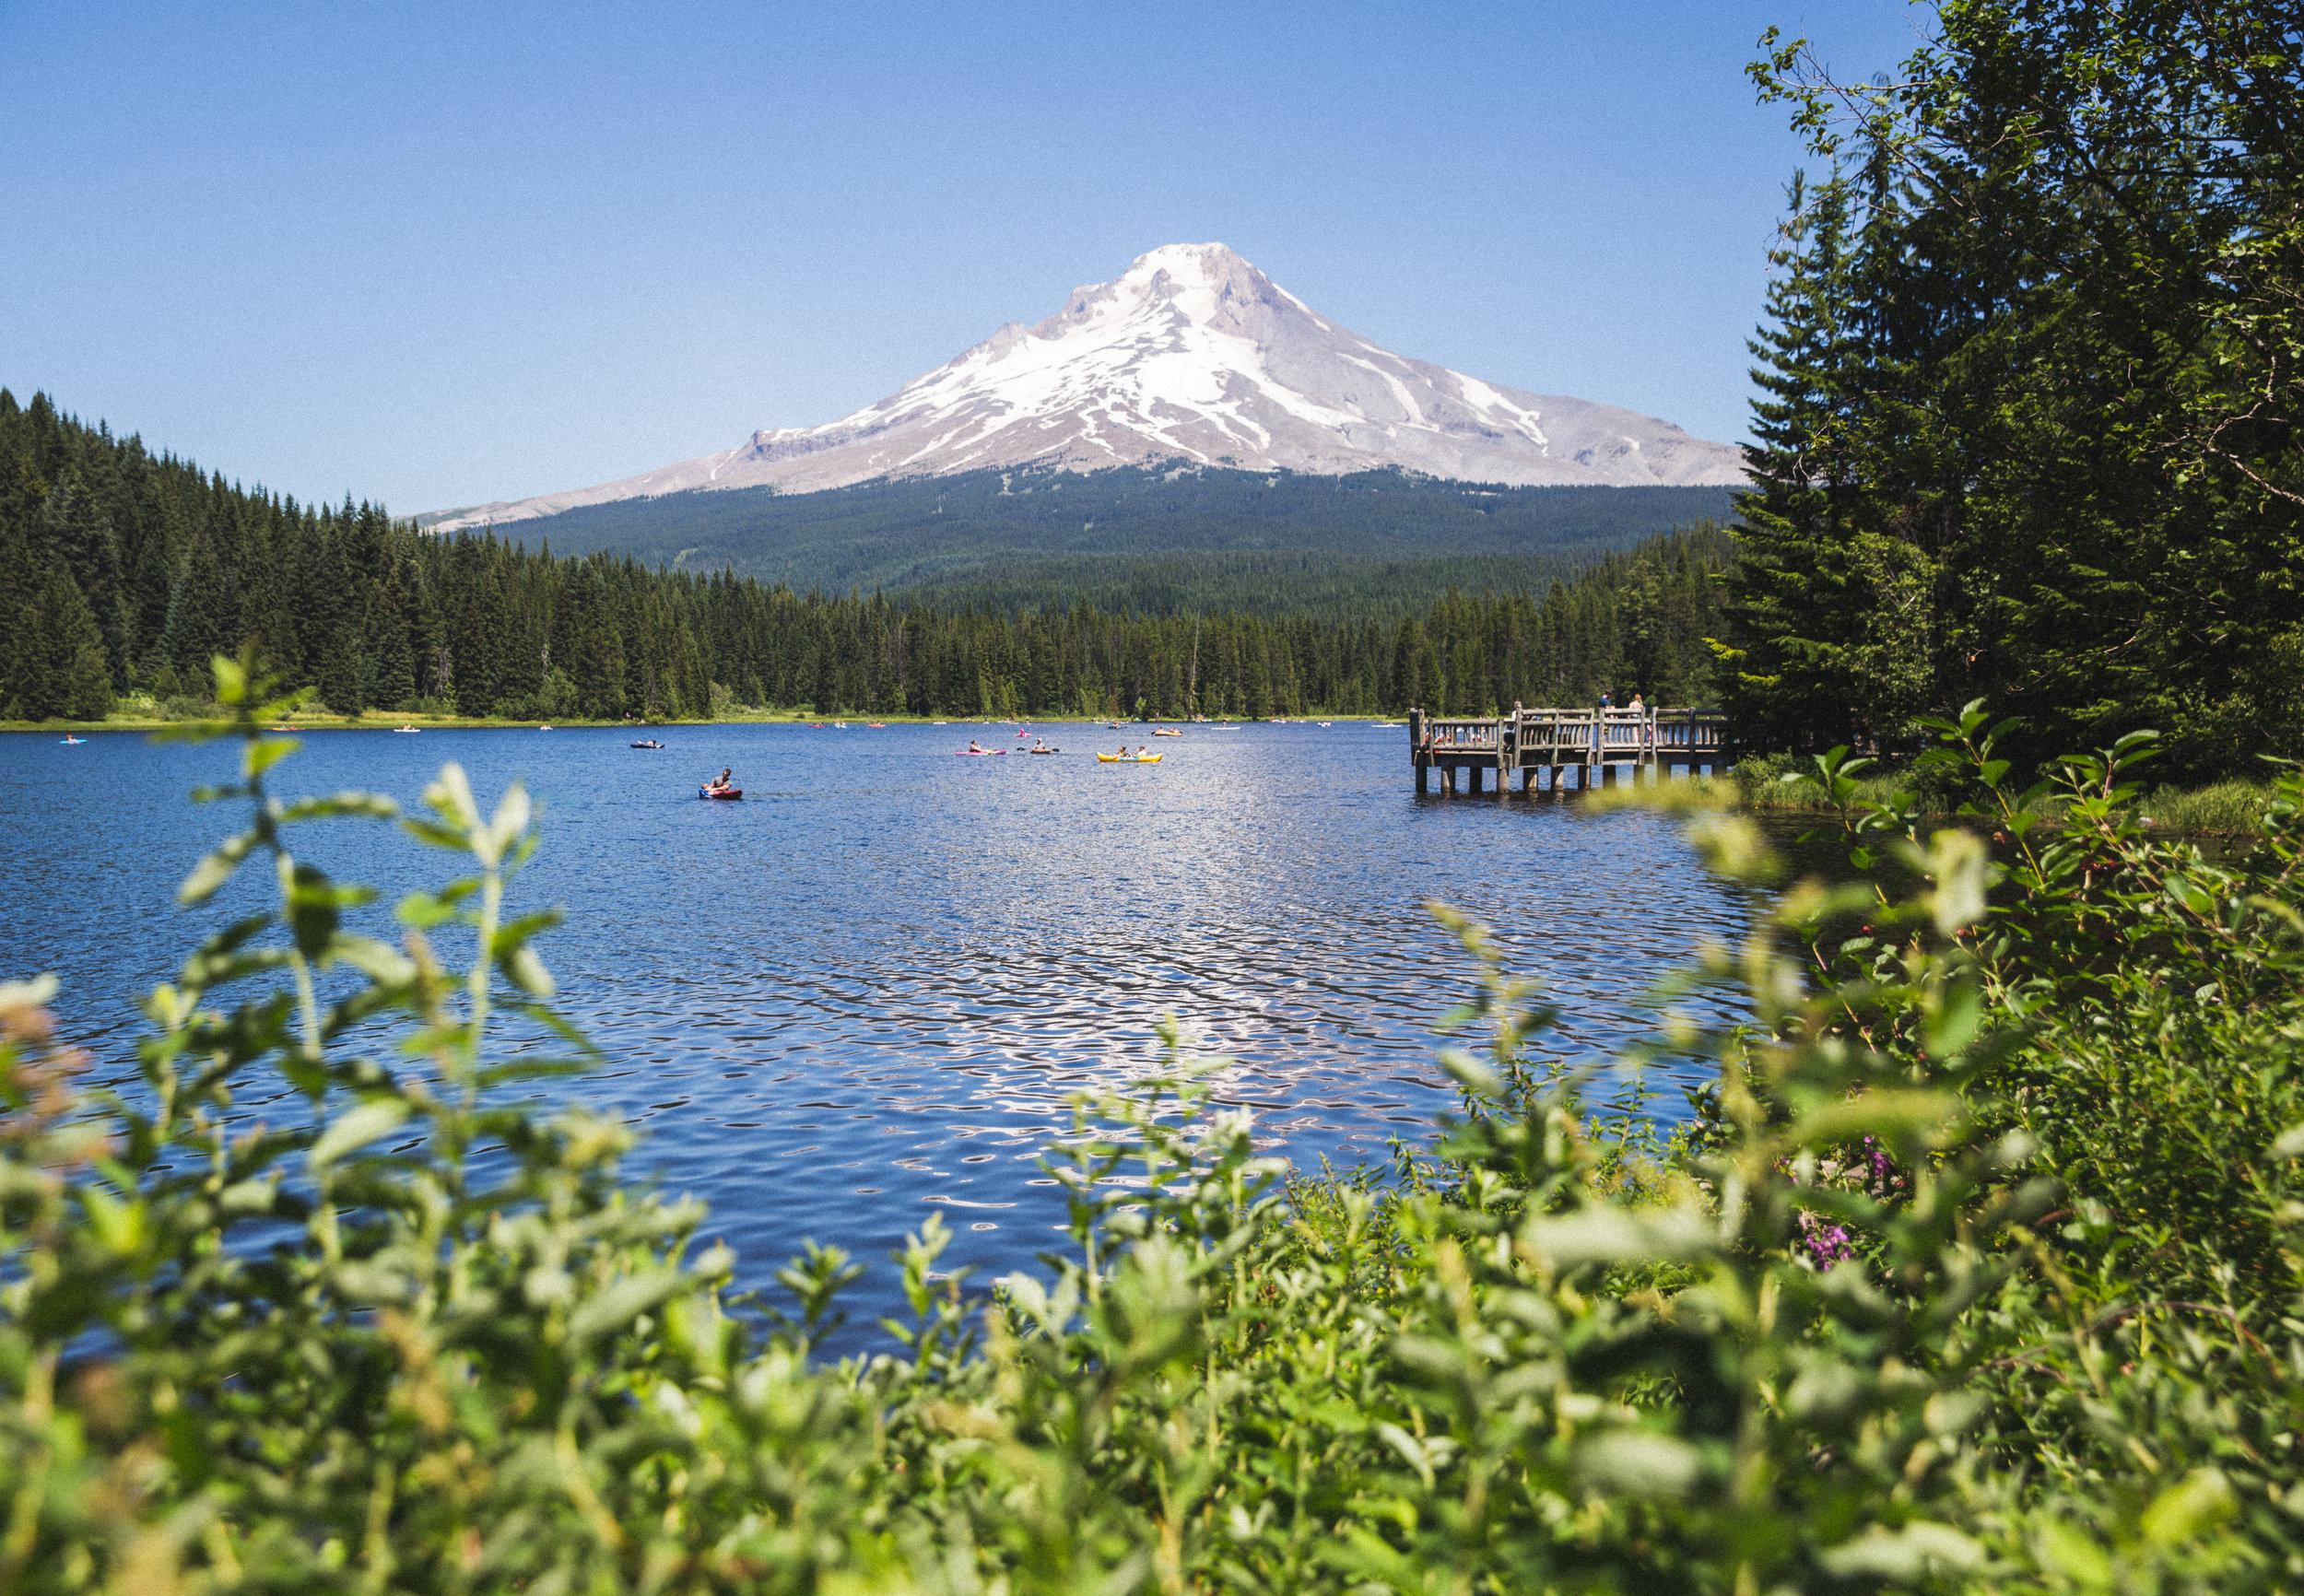 Oregon July 2018 Exported Photos-1.jpg